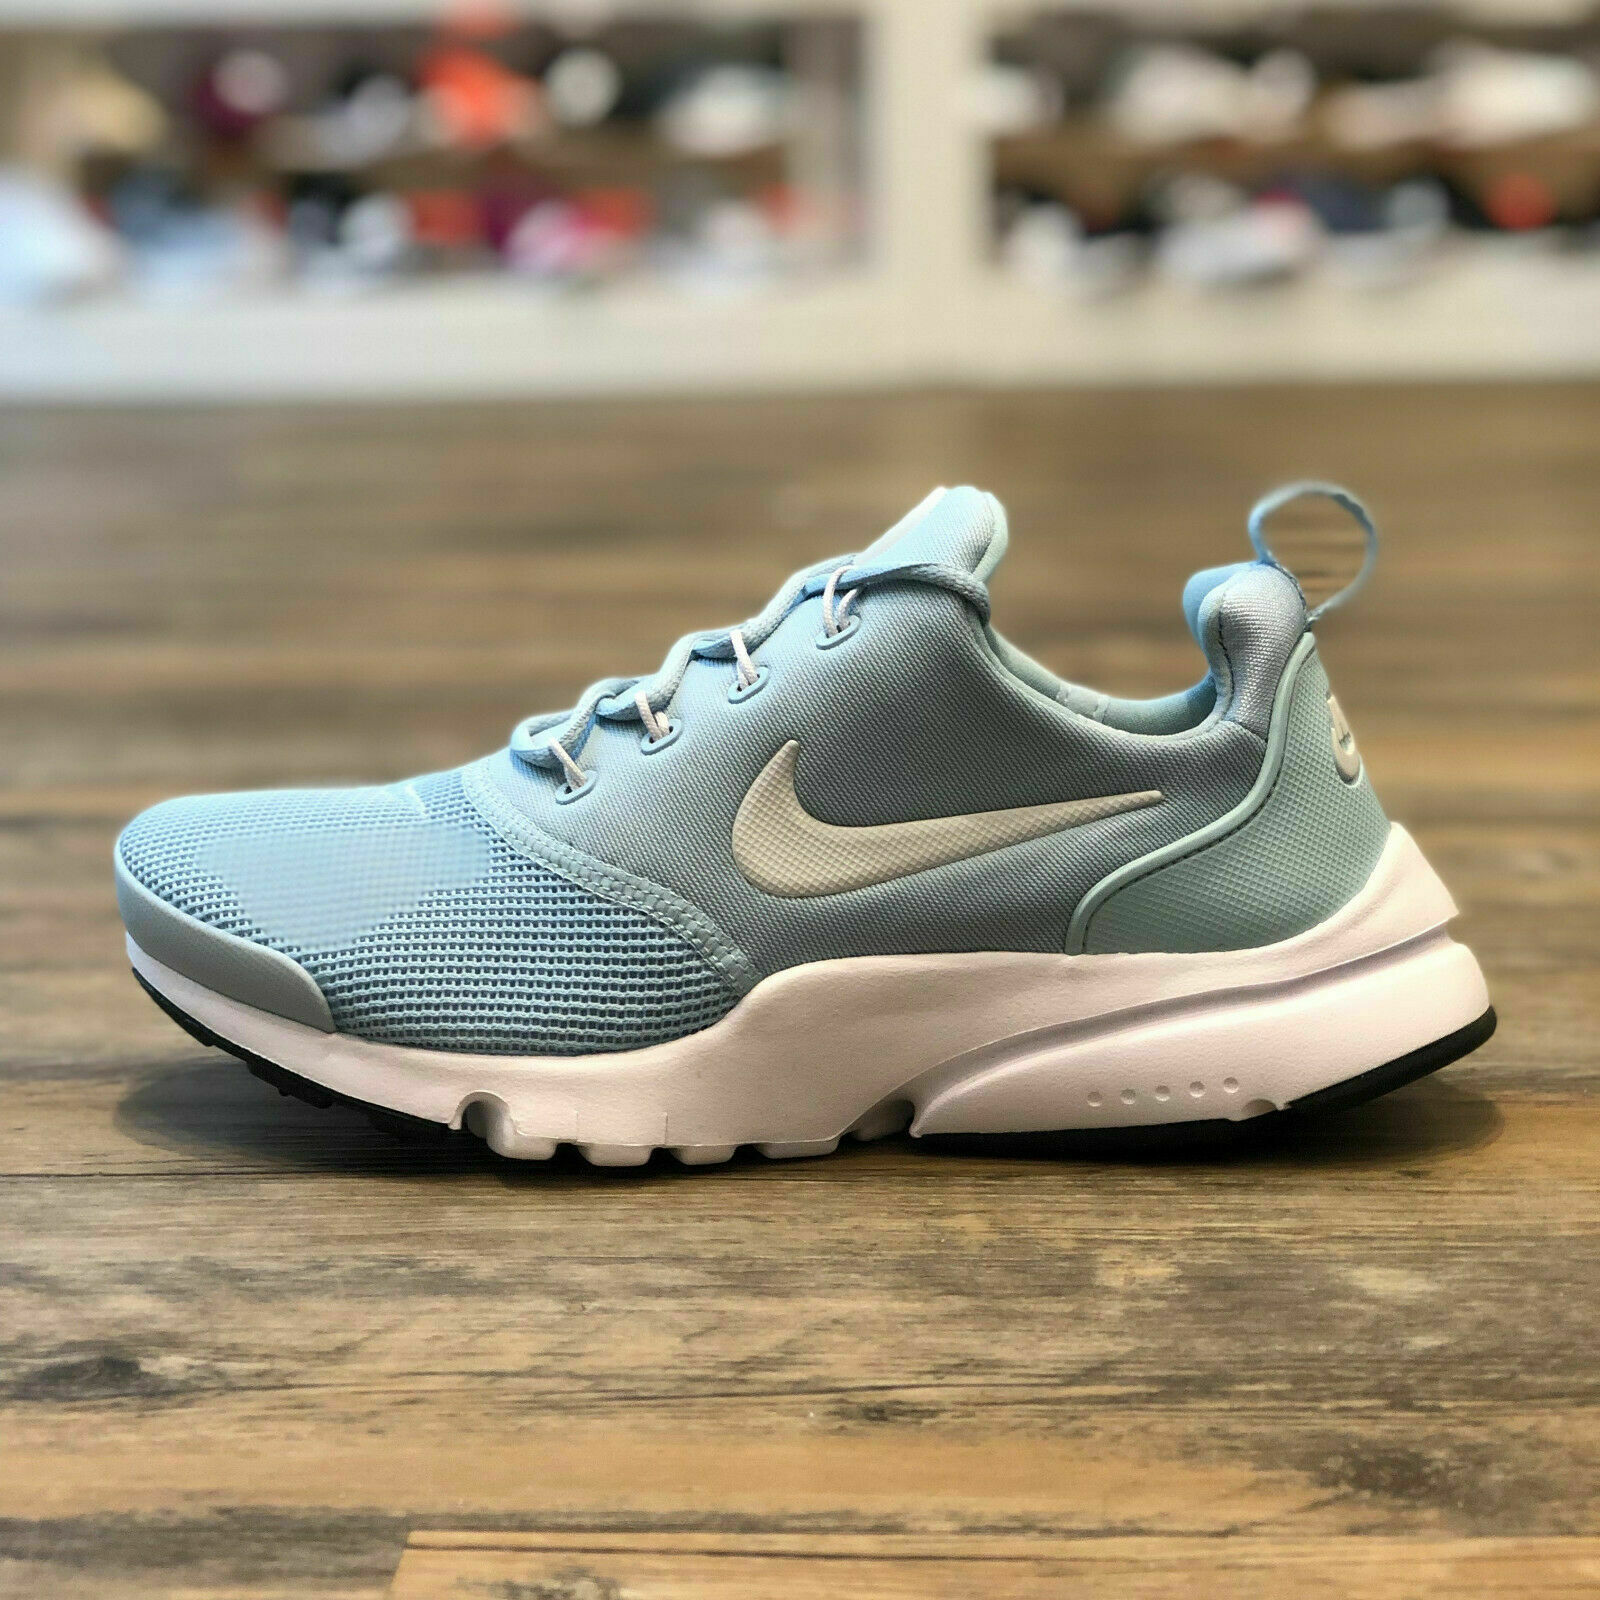 Nike Presto Gr.36 Running Turnschuhe blau mint Free Schuhe Fintess 913967 401